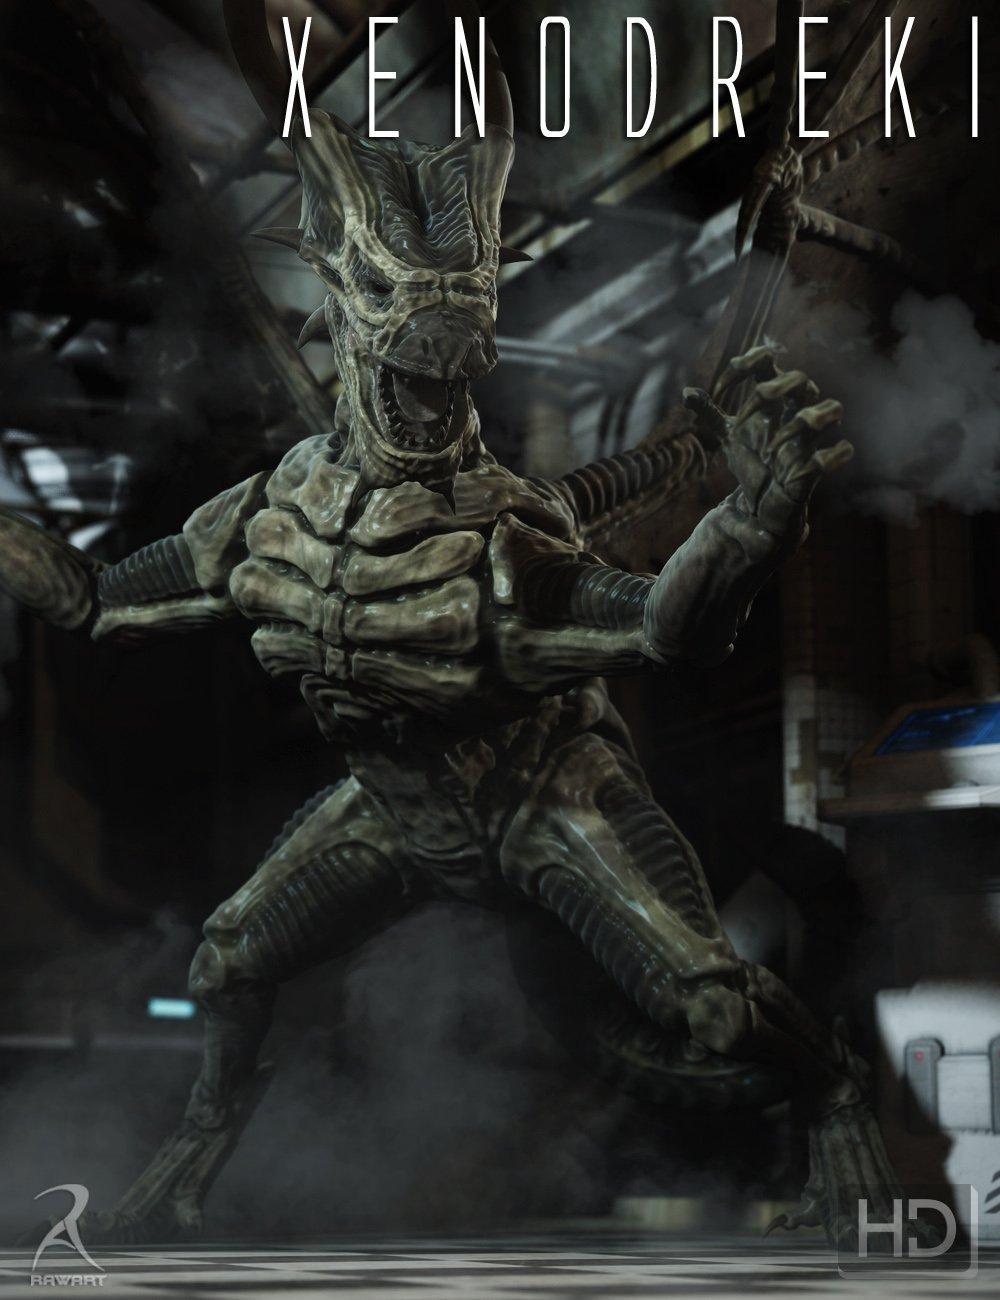 Xenodreki – The Alien Dragon HD_DAZ3D下载站